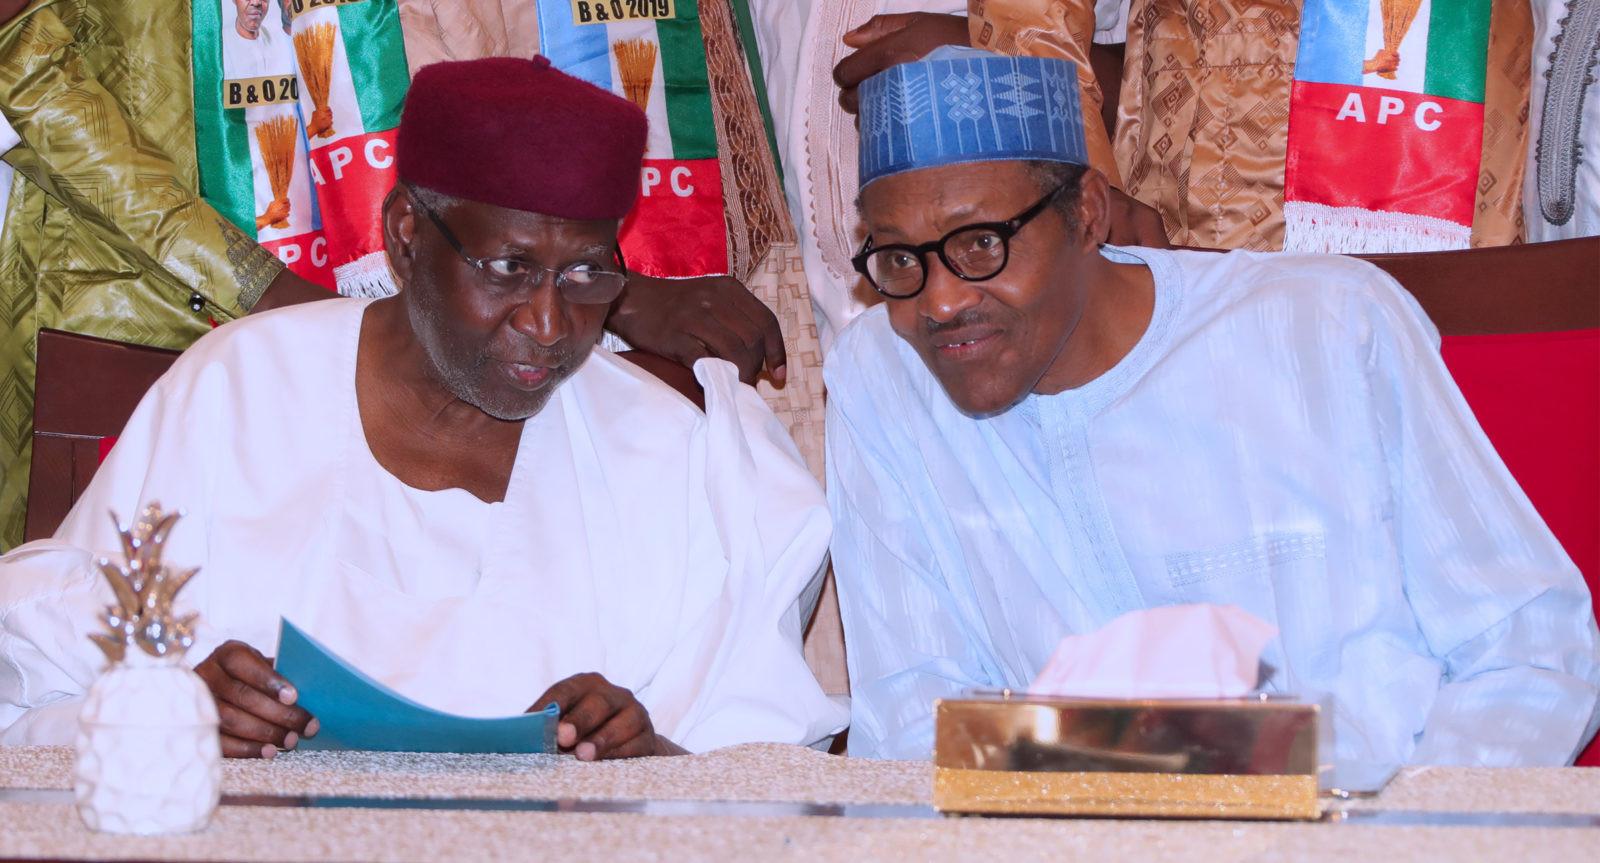 COVID-19: Presidency keeps mum over Buhari, Abba Kyari status